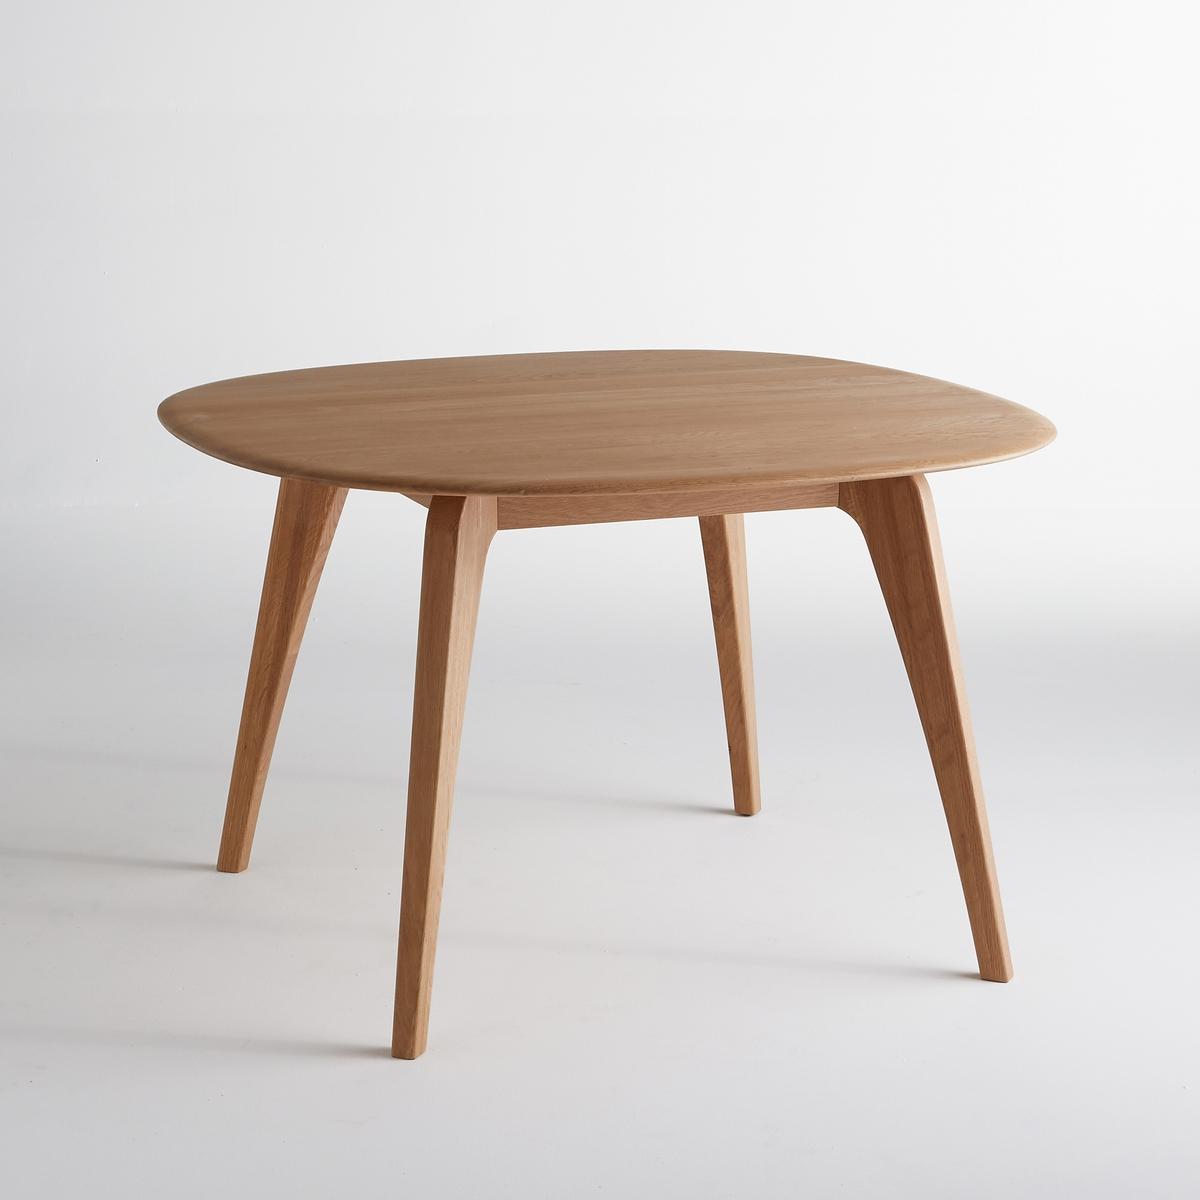 Стол из массива дуба Ø120 см, Ladosse